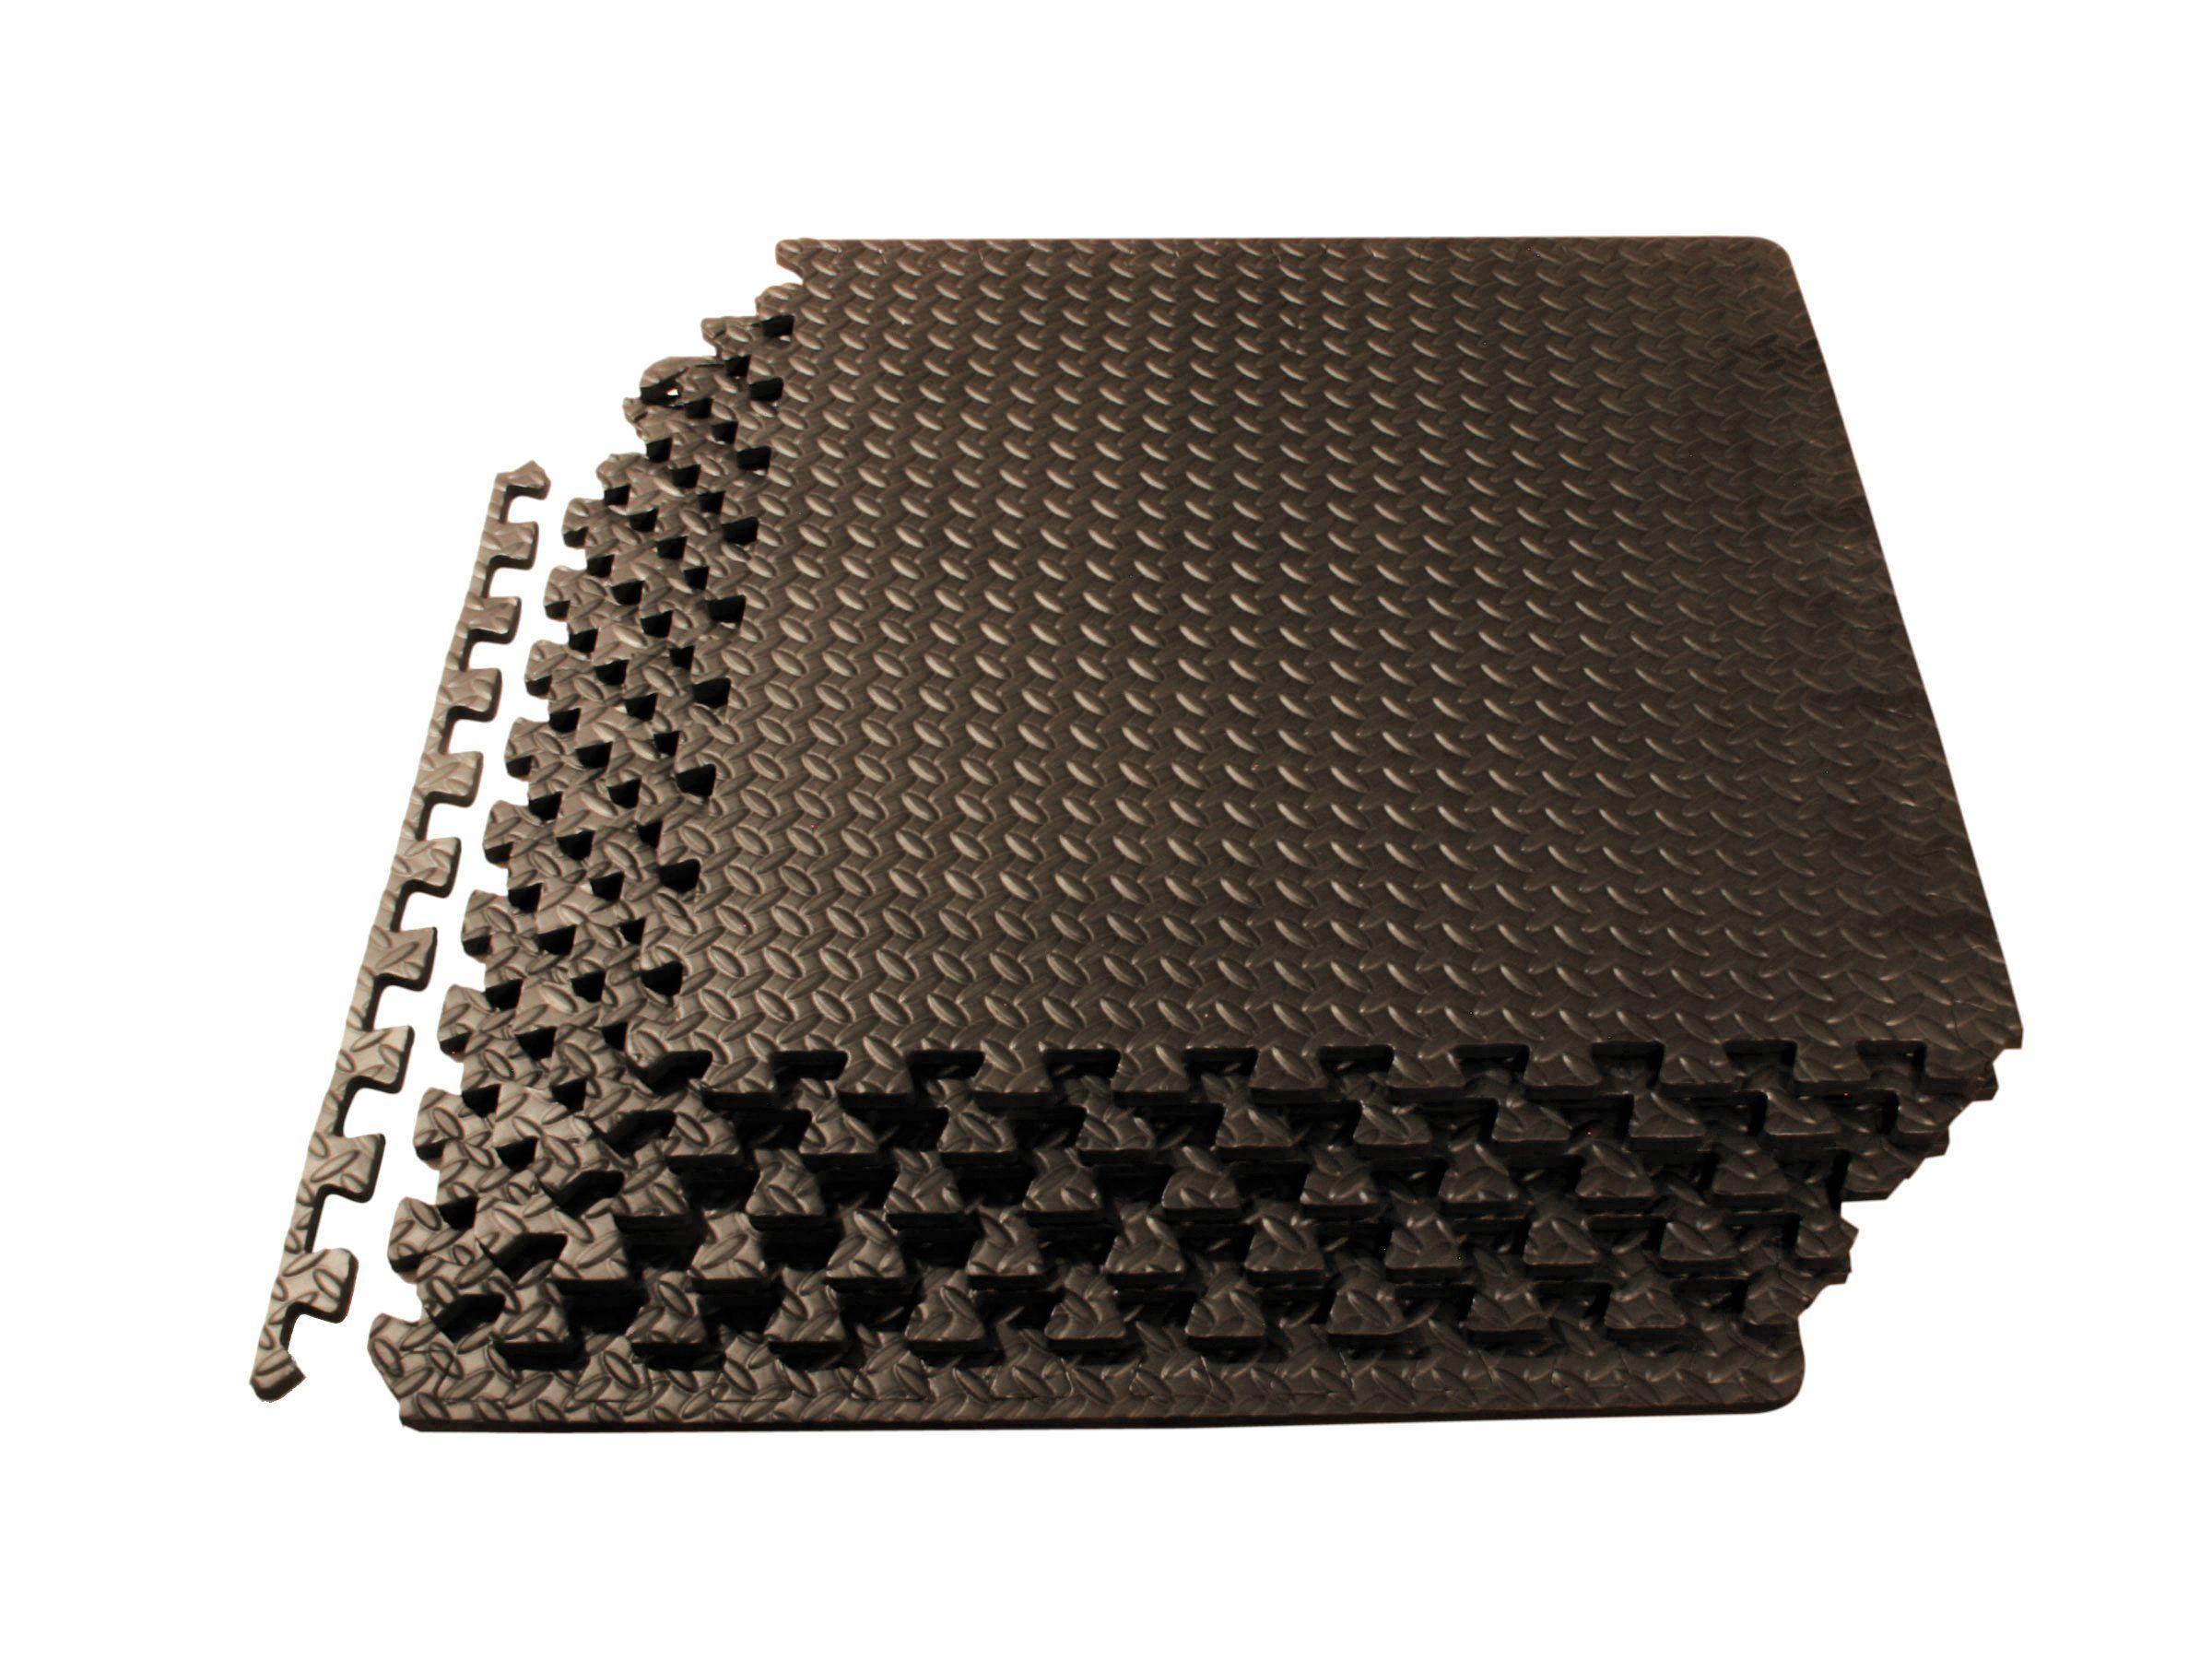 Prosource Puzzle Exercise Mat High Quality Eva Foam Interlocking